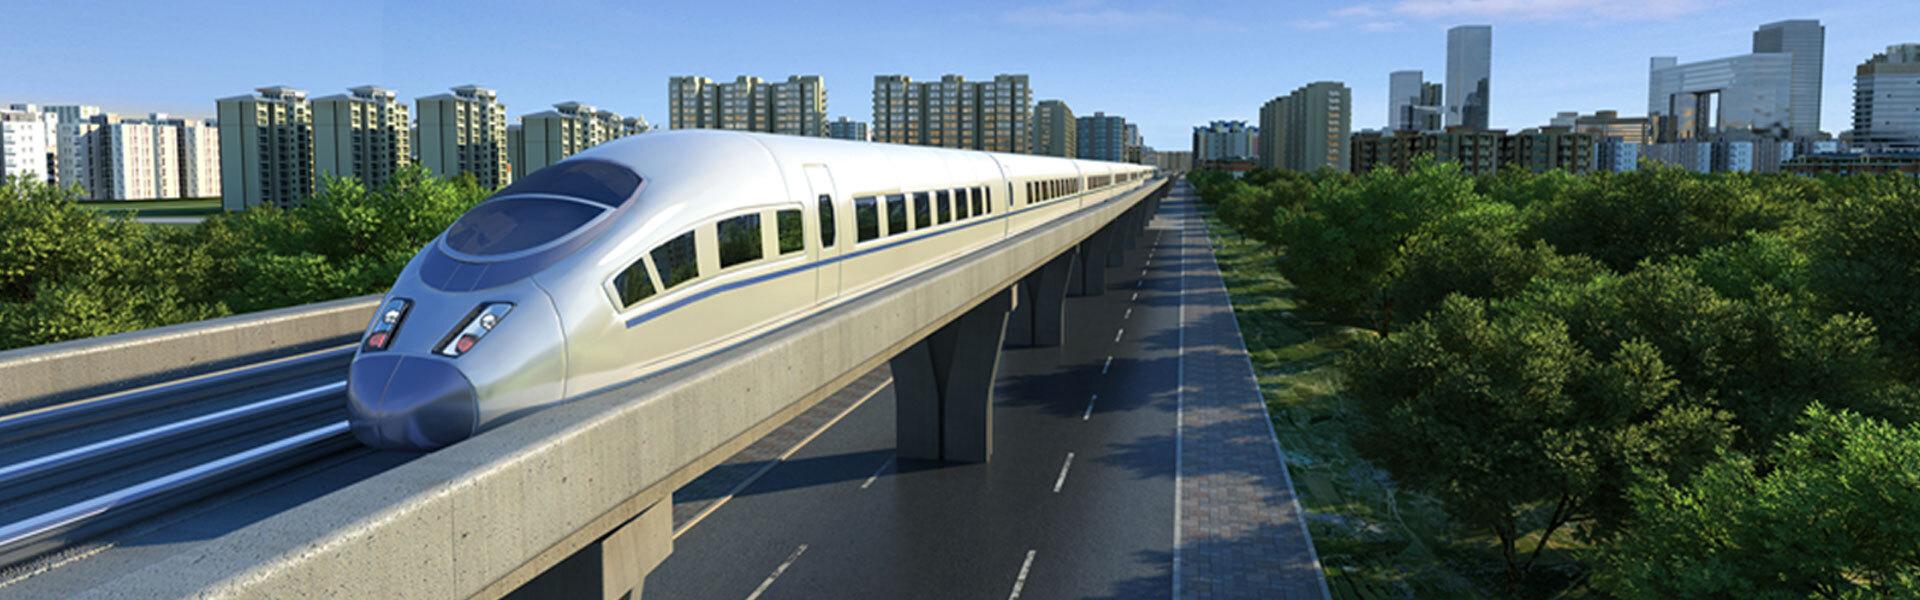 KSCAN-MAGIC三维扫描仪在铁路桥梁检测中的应用